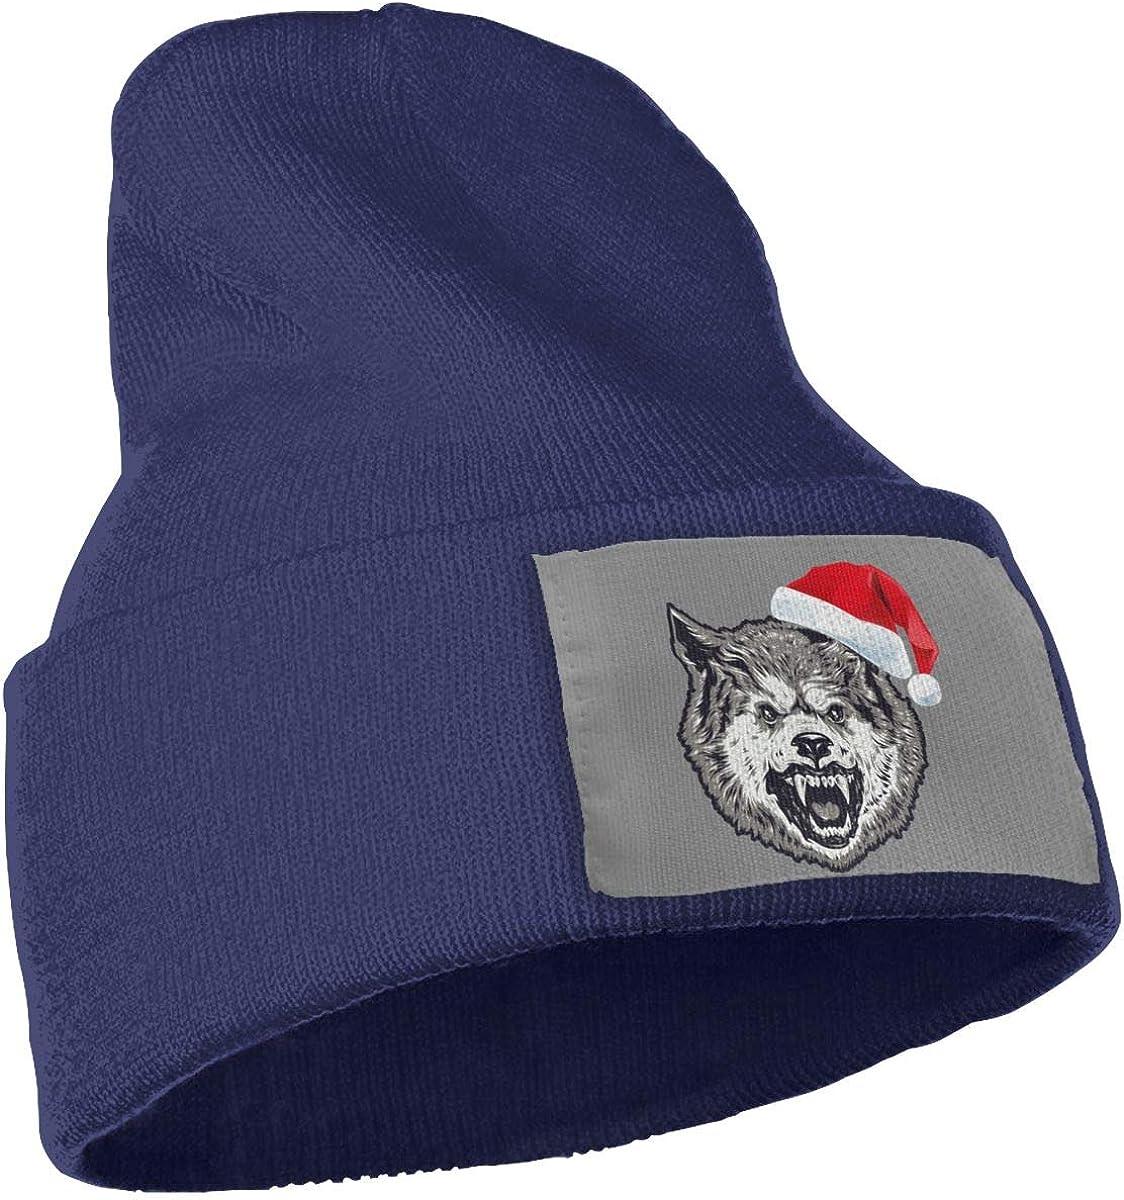 Oopp Jfhg Christmas Bear Wool Cap Knit Caps Unisex Winter Navy